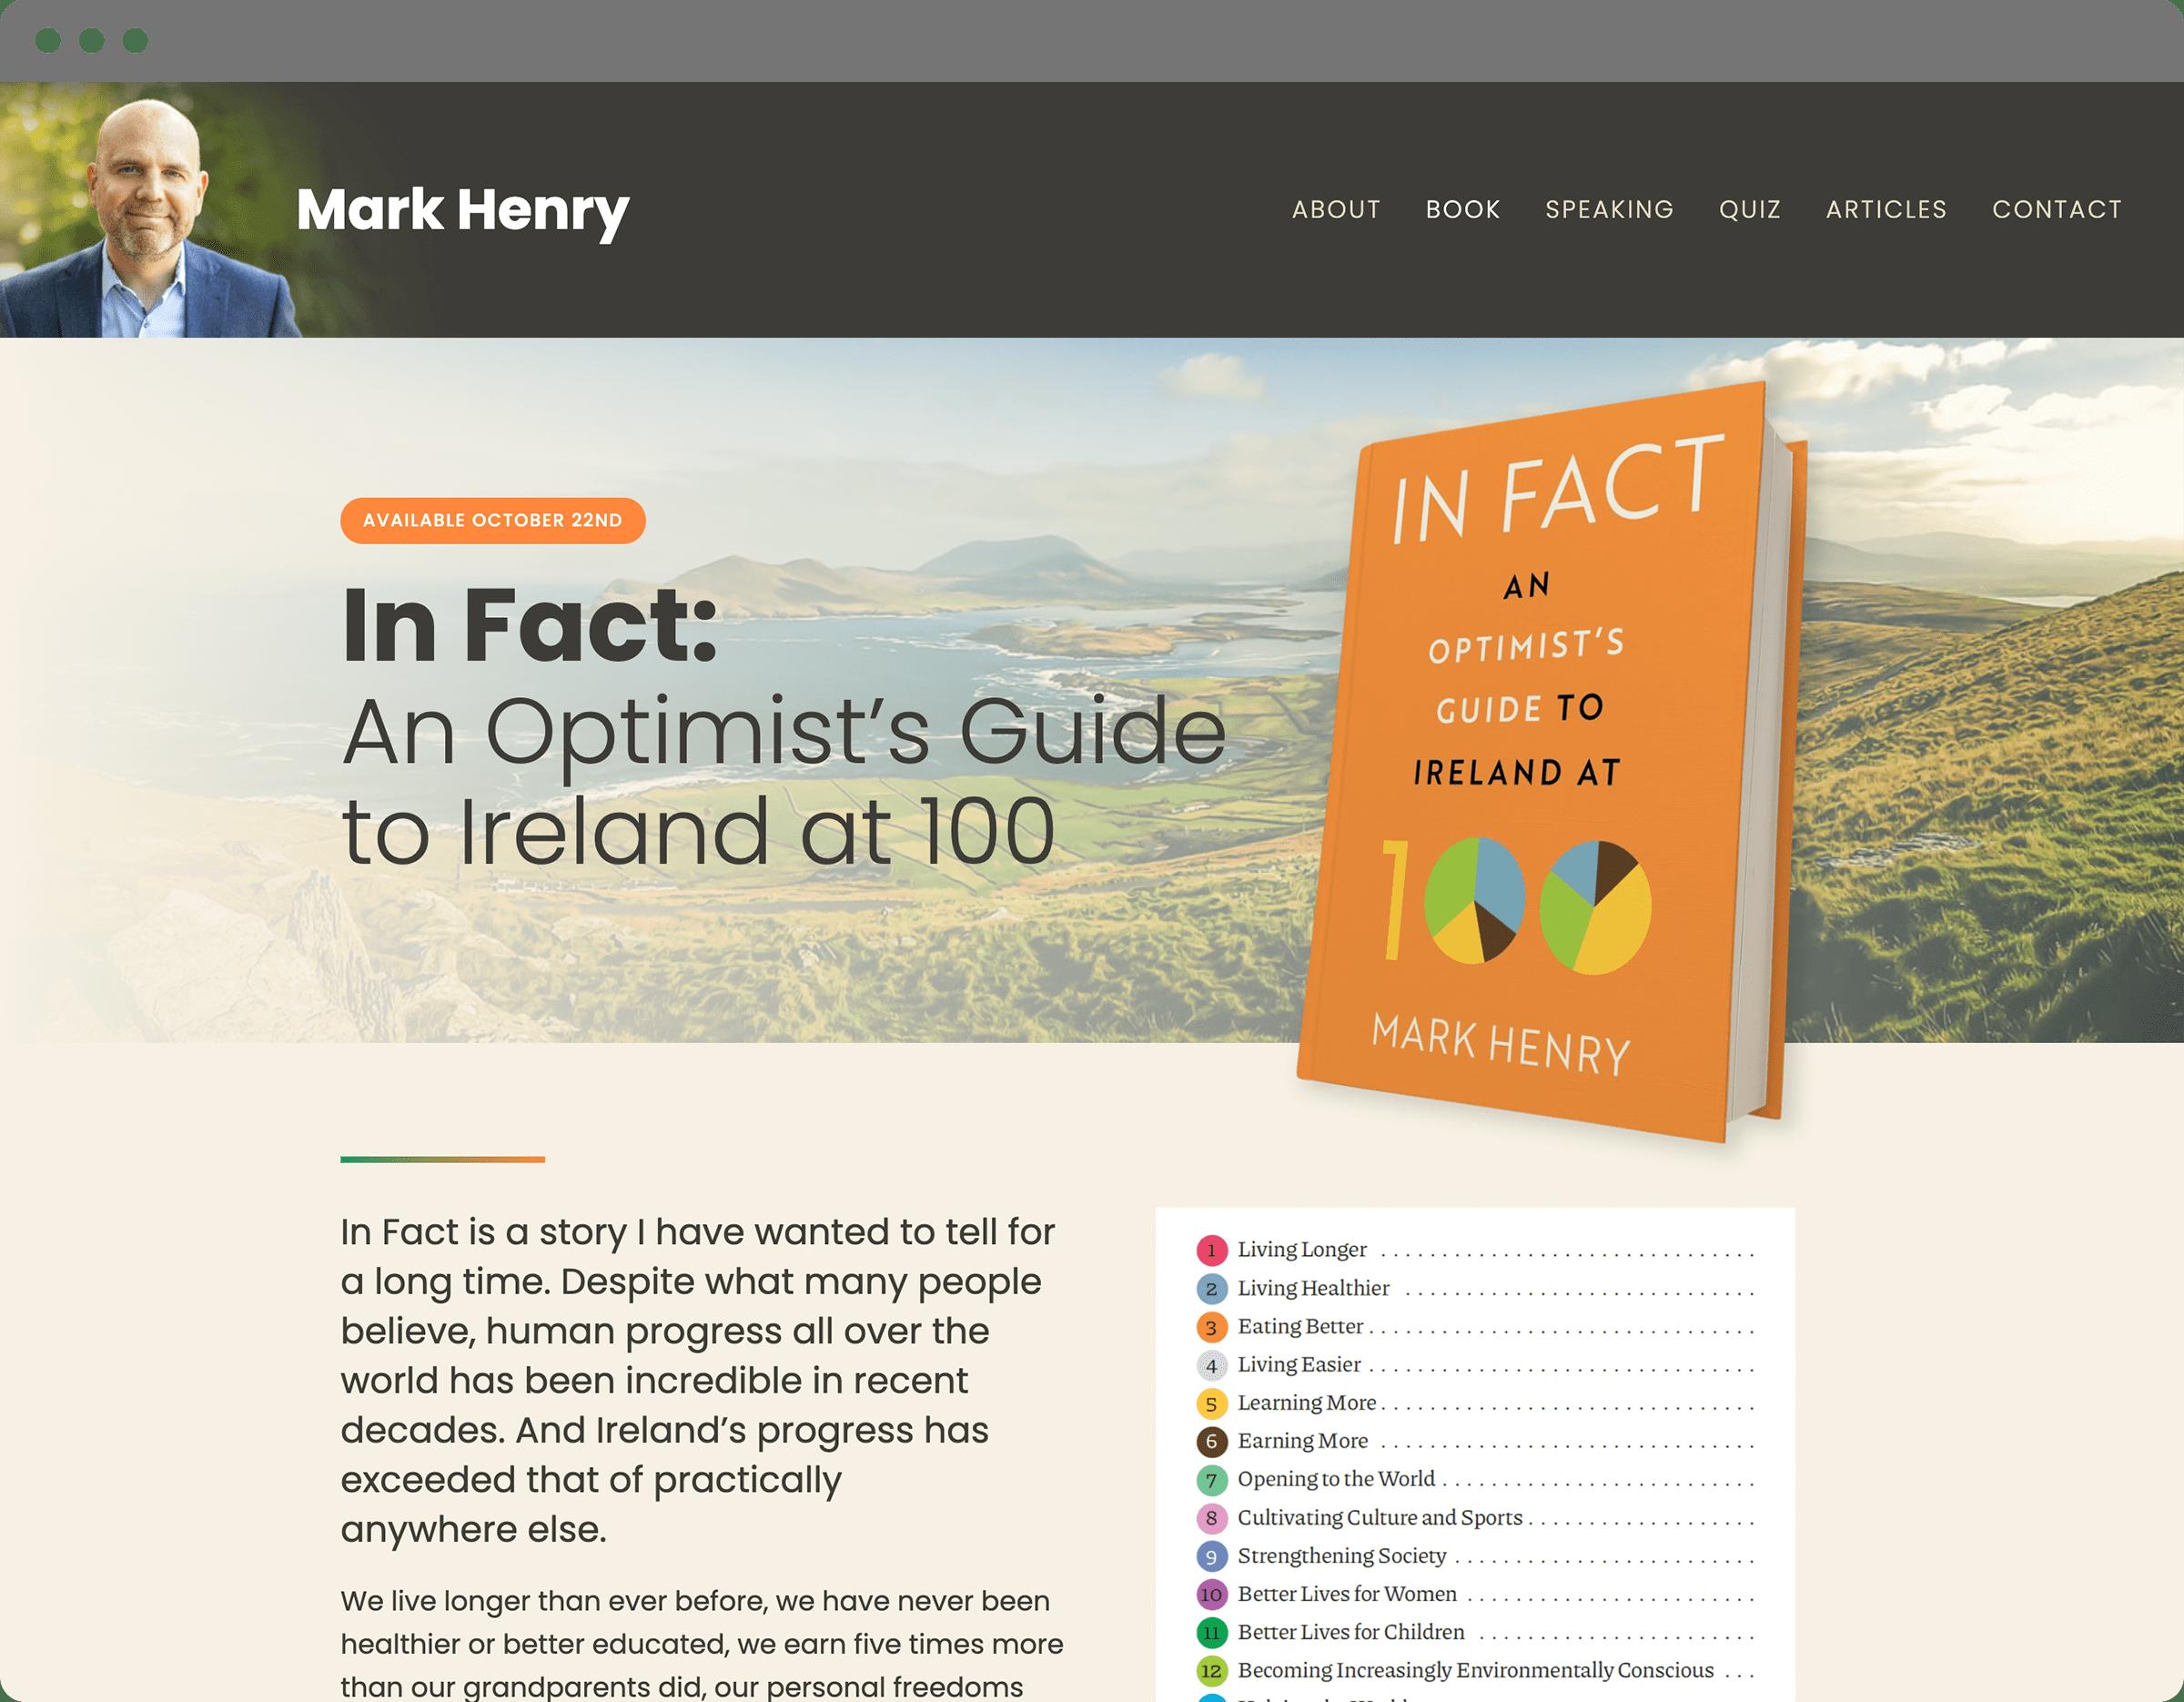 Mark Henry website book page